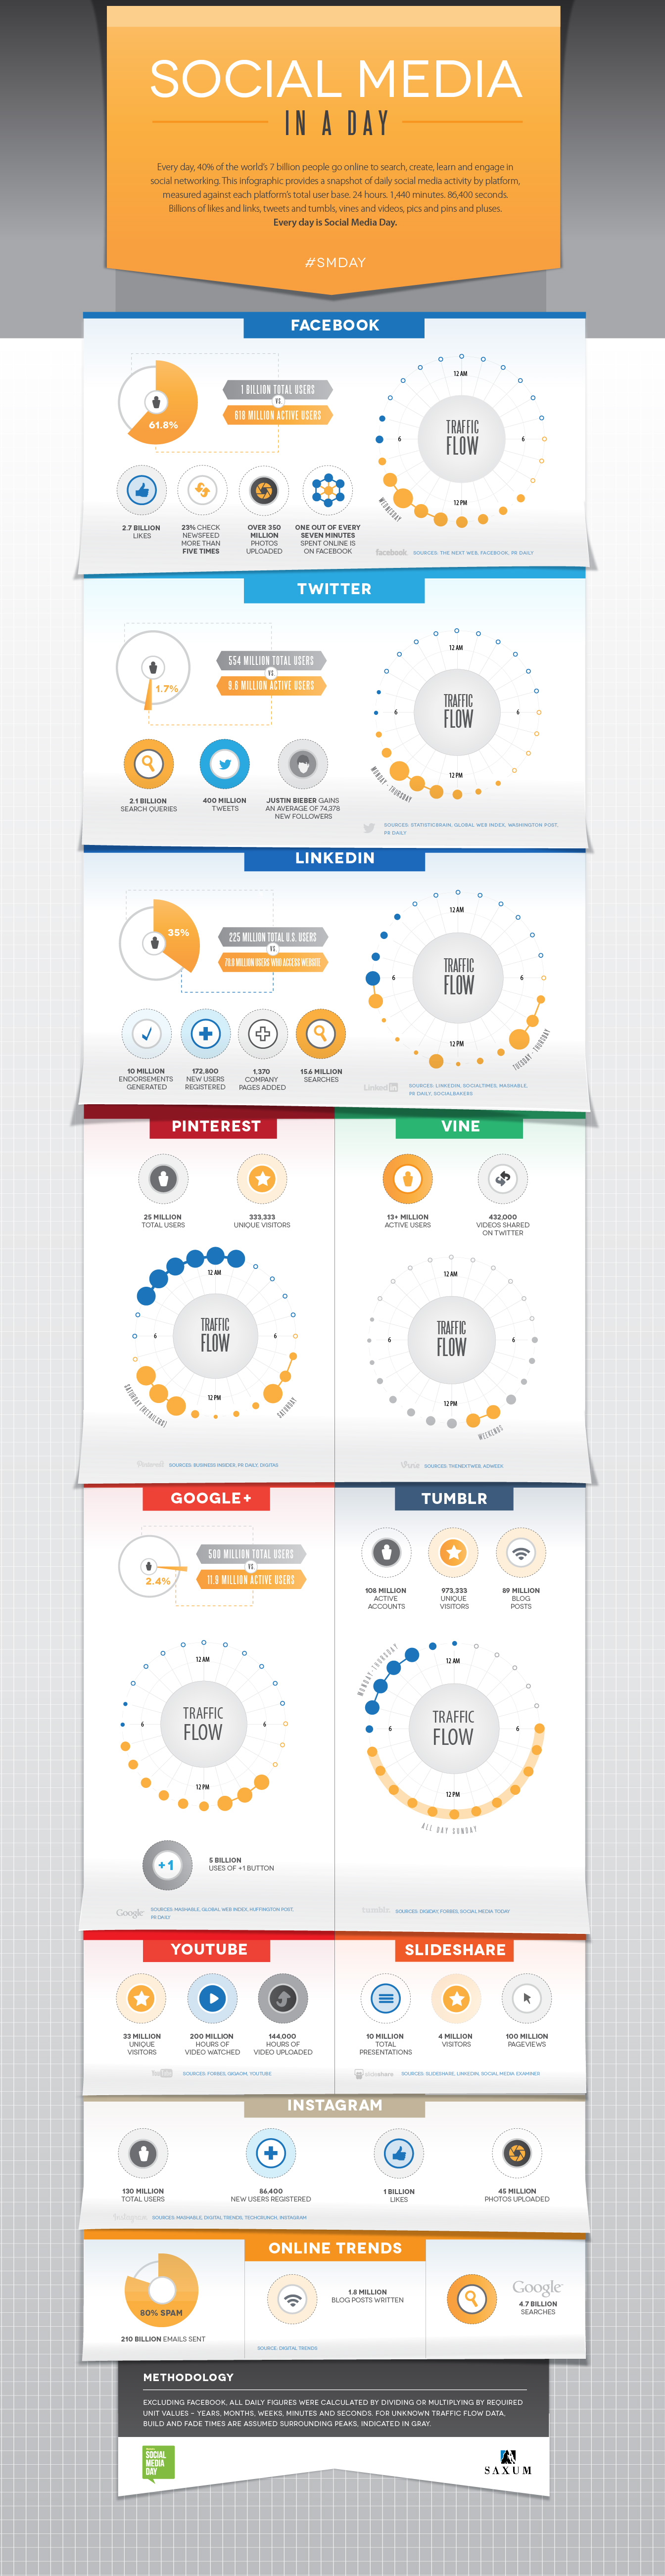 Saxum_SocialMediaDay_Infographic-Blog